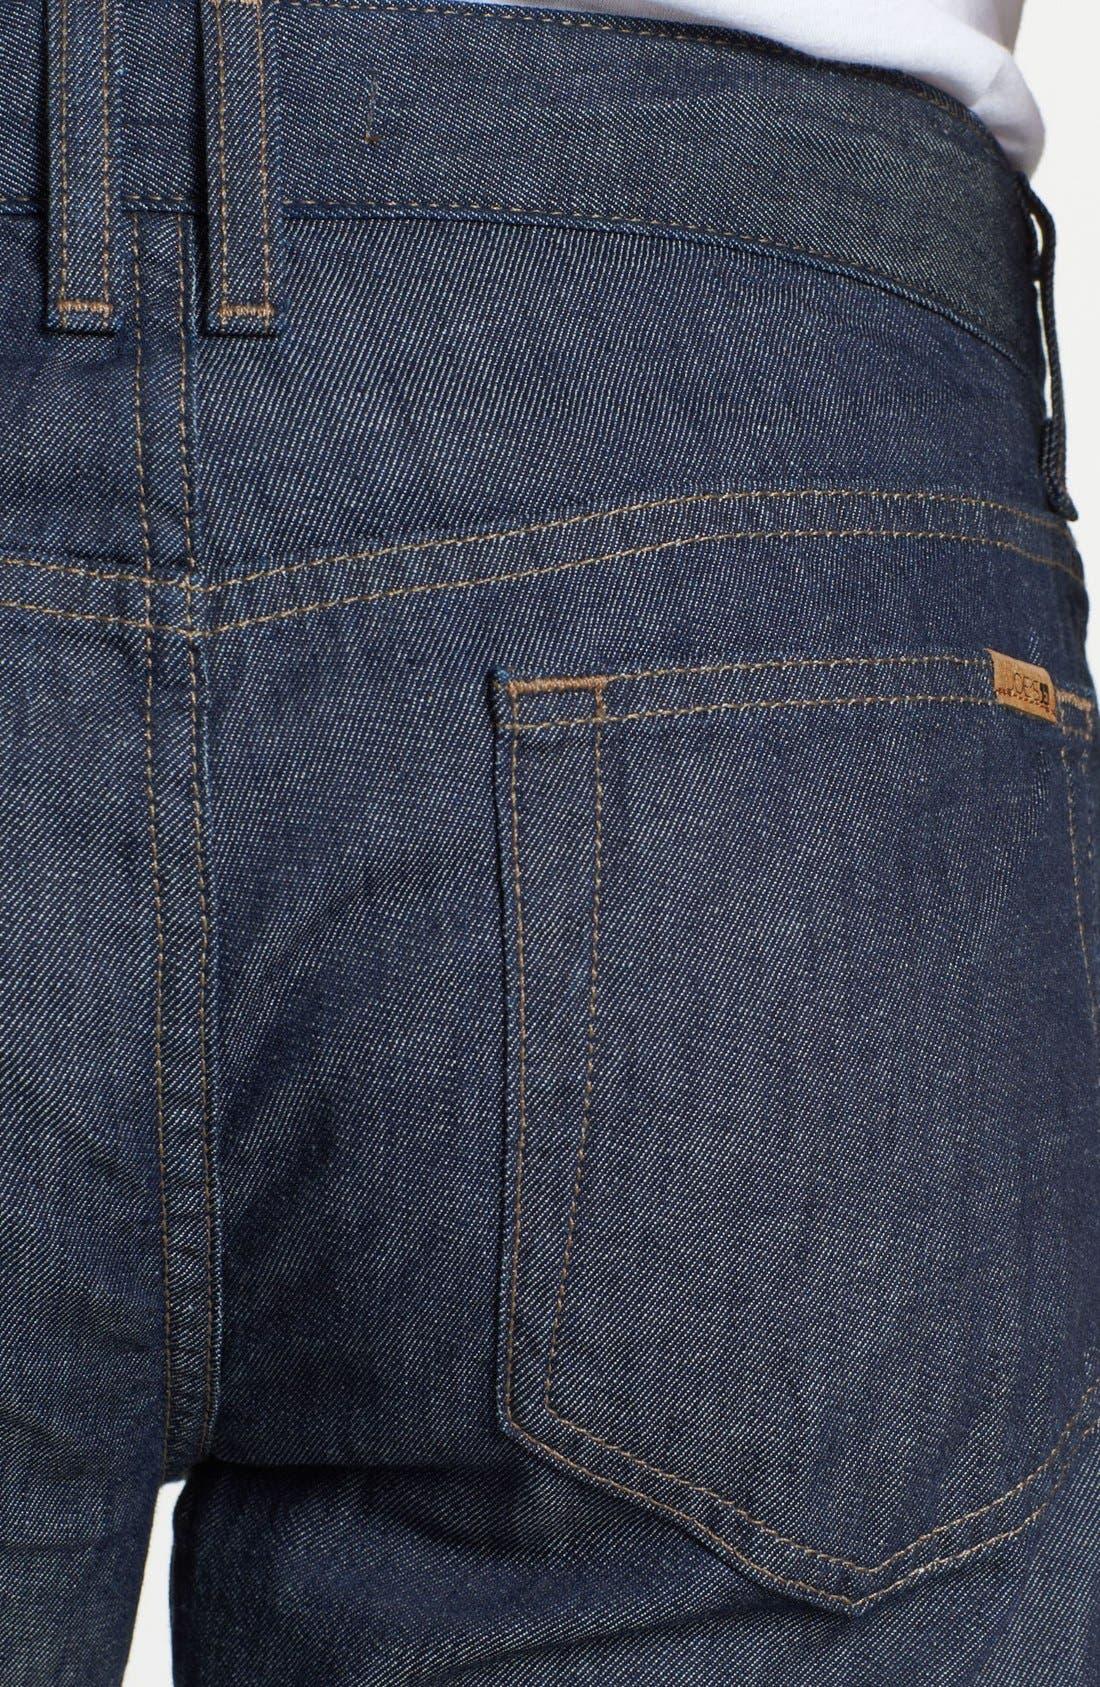 Alternate Image 4  - Joe's 'Brixton' Slim Fit Selvedge Jeans (Laures)